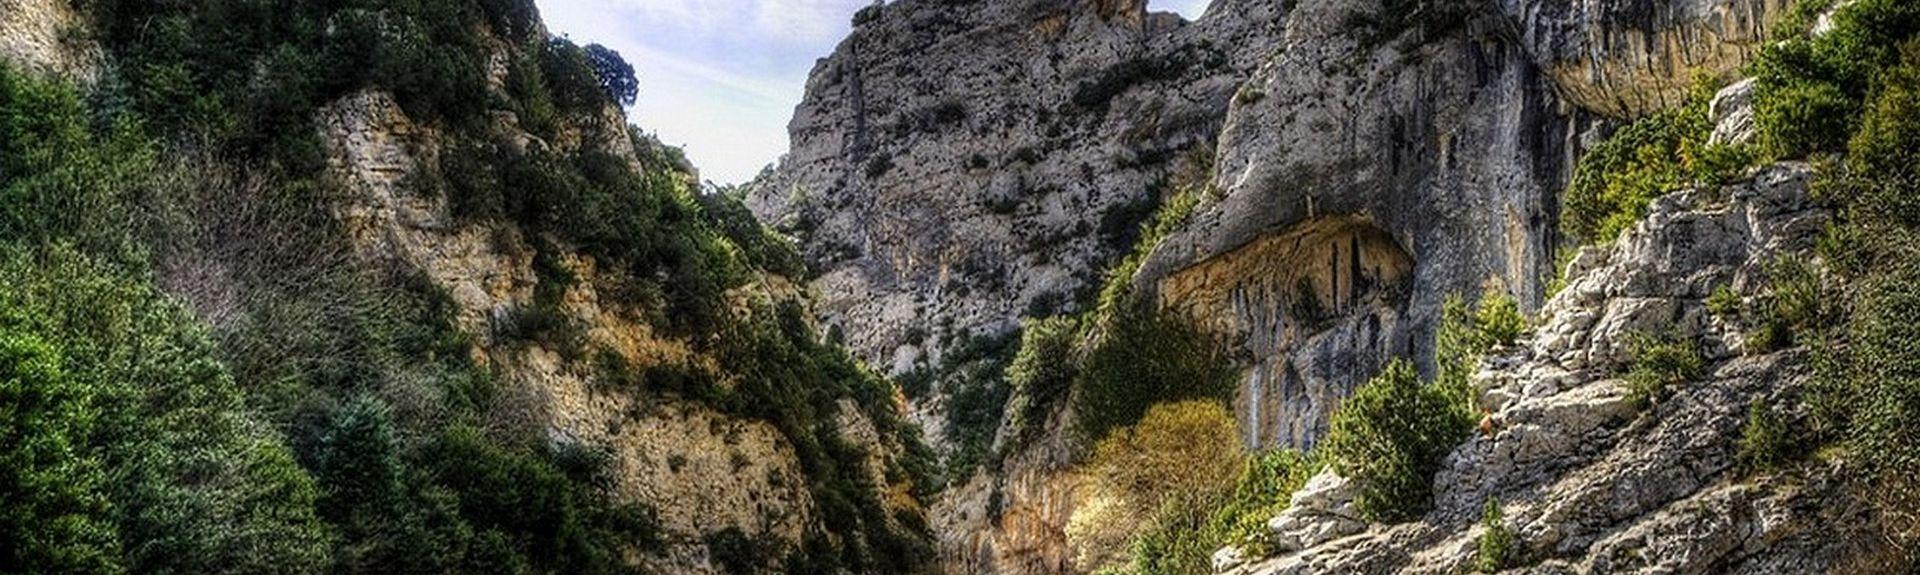 Casbas de Huesca, Aragón, Spagna